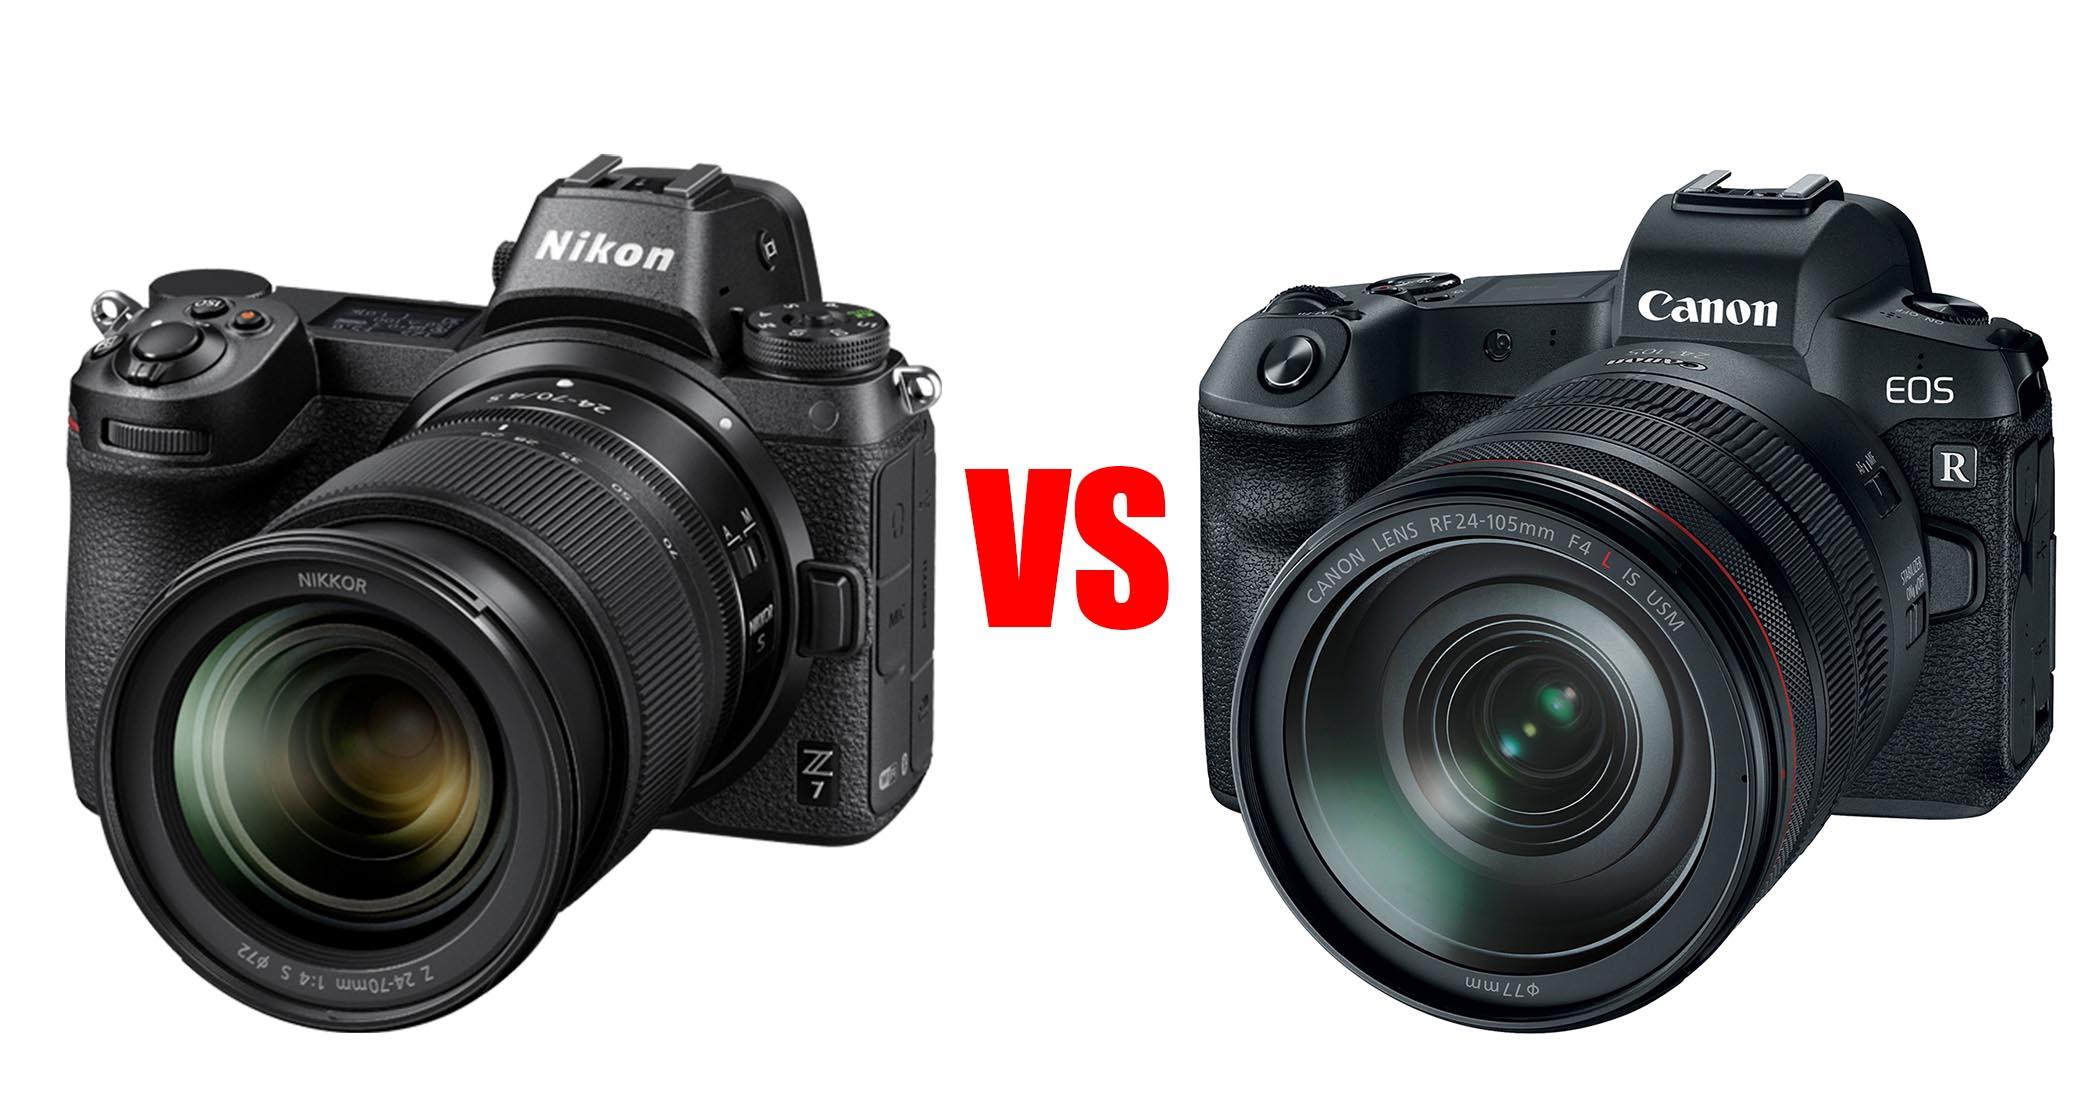 nikon z7 vs canon eos r image